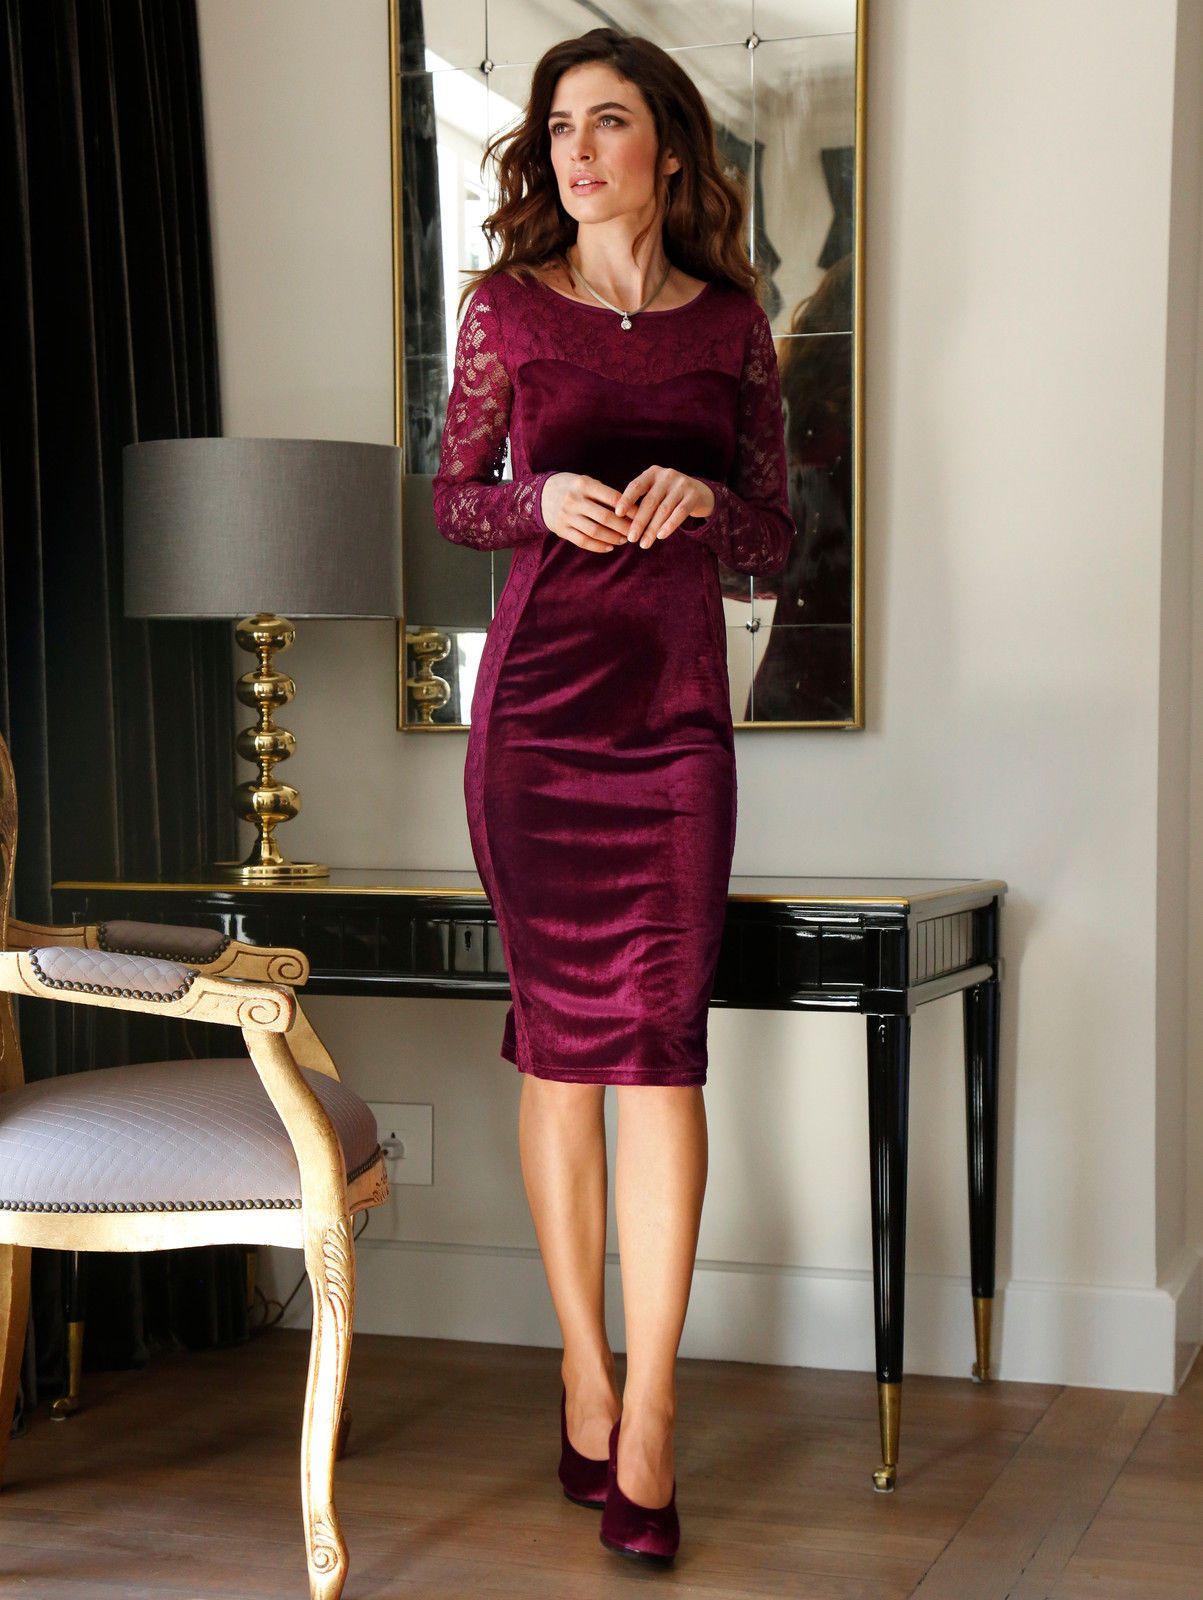 KLiNGEL Samtkleid in schmaler Form Neu | eBay